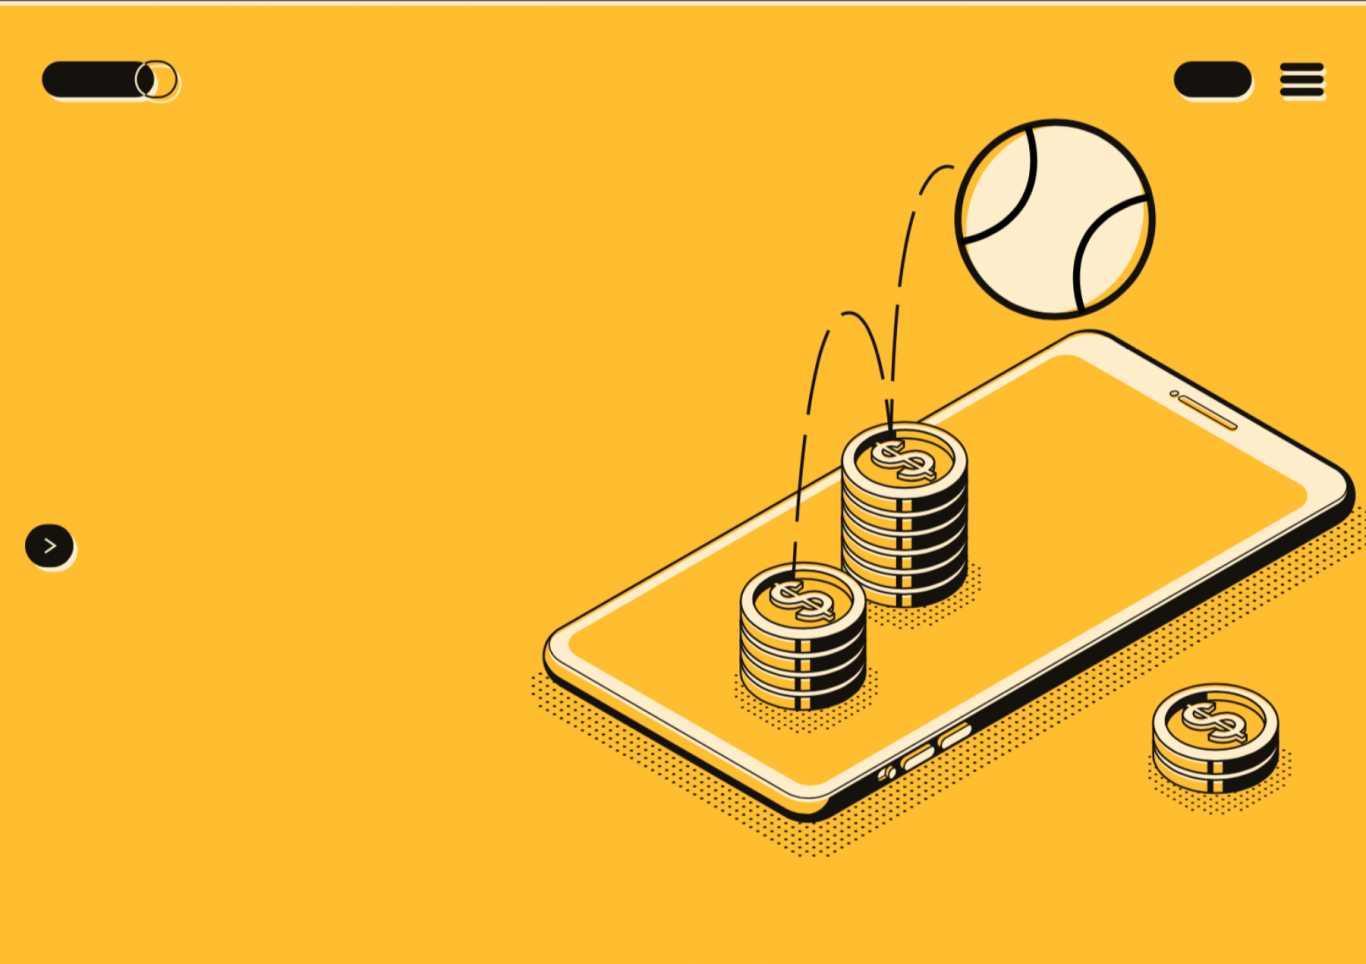 Open Betting Account